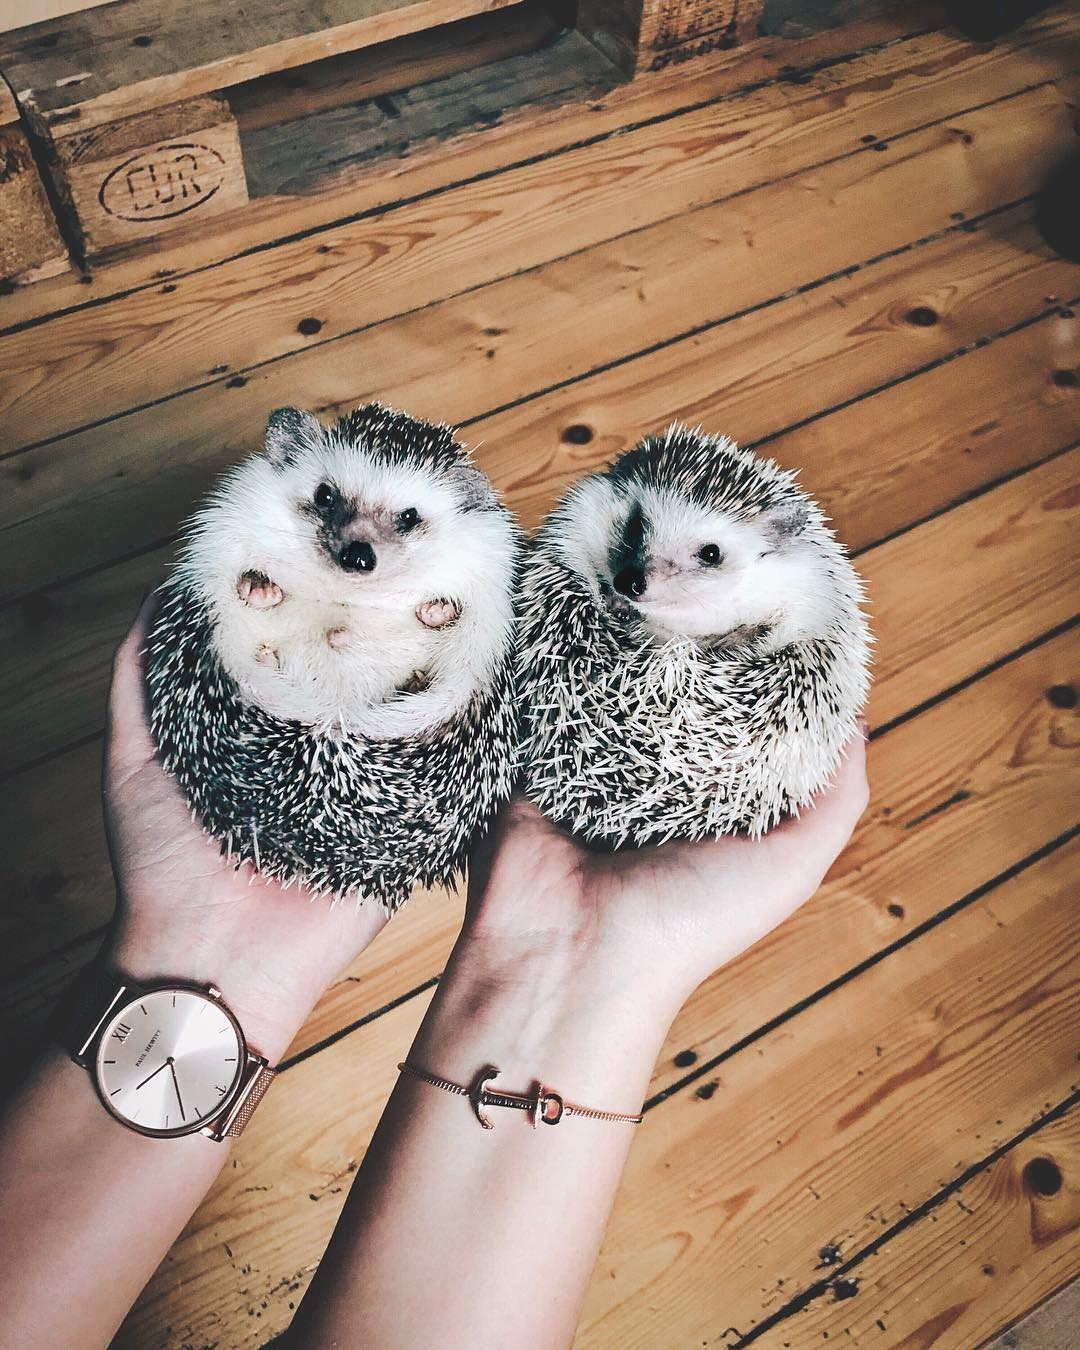 Pin By Frankee On Insert Heart Eyes Emoji Here Hedgehog Pet Cute Baby Animals Cute Animals